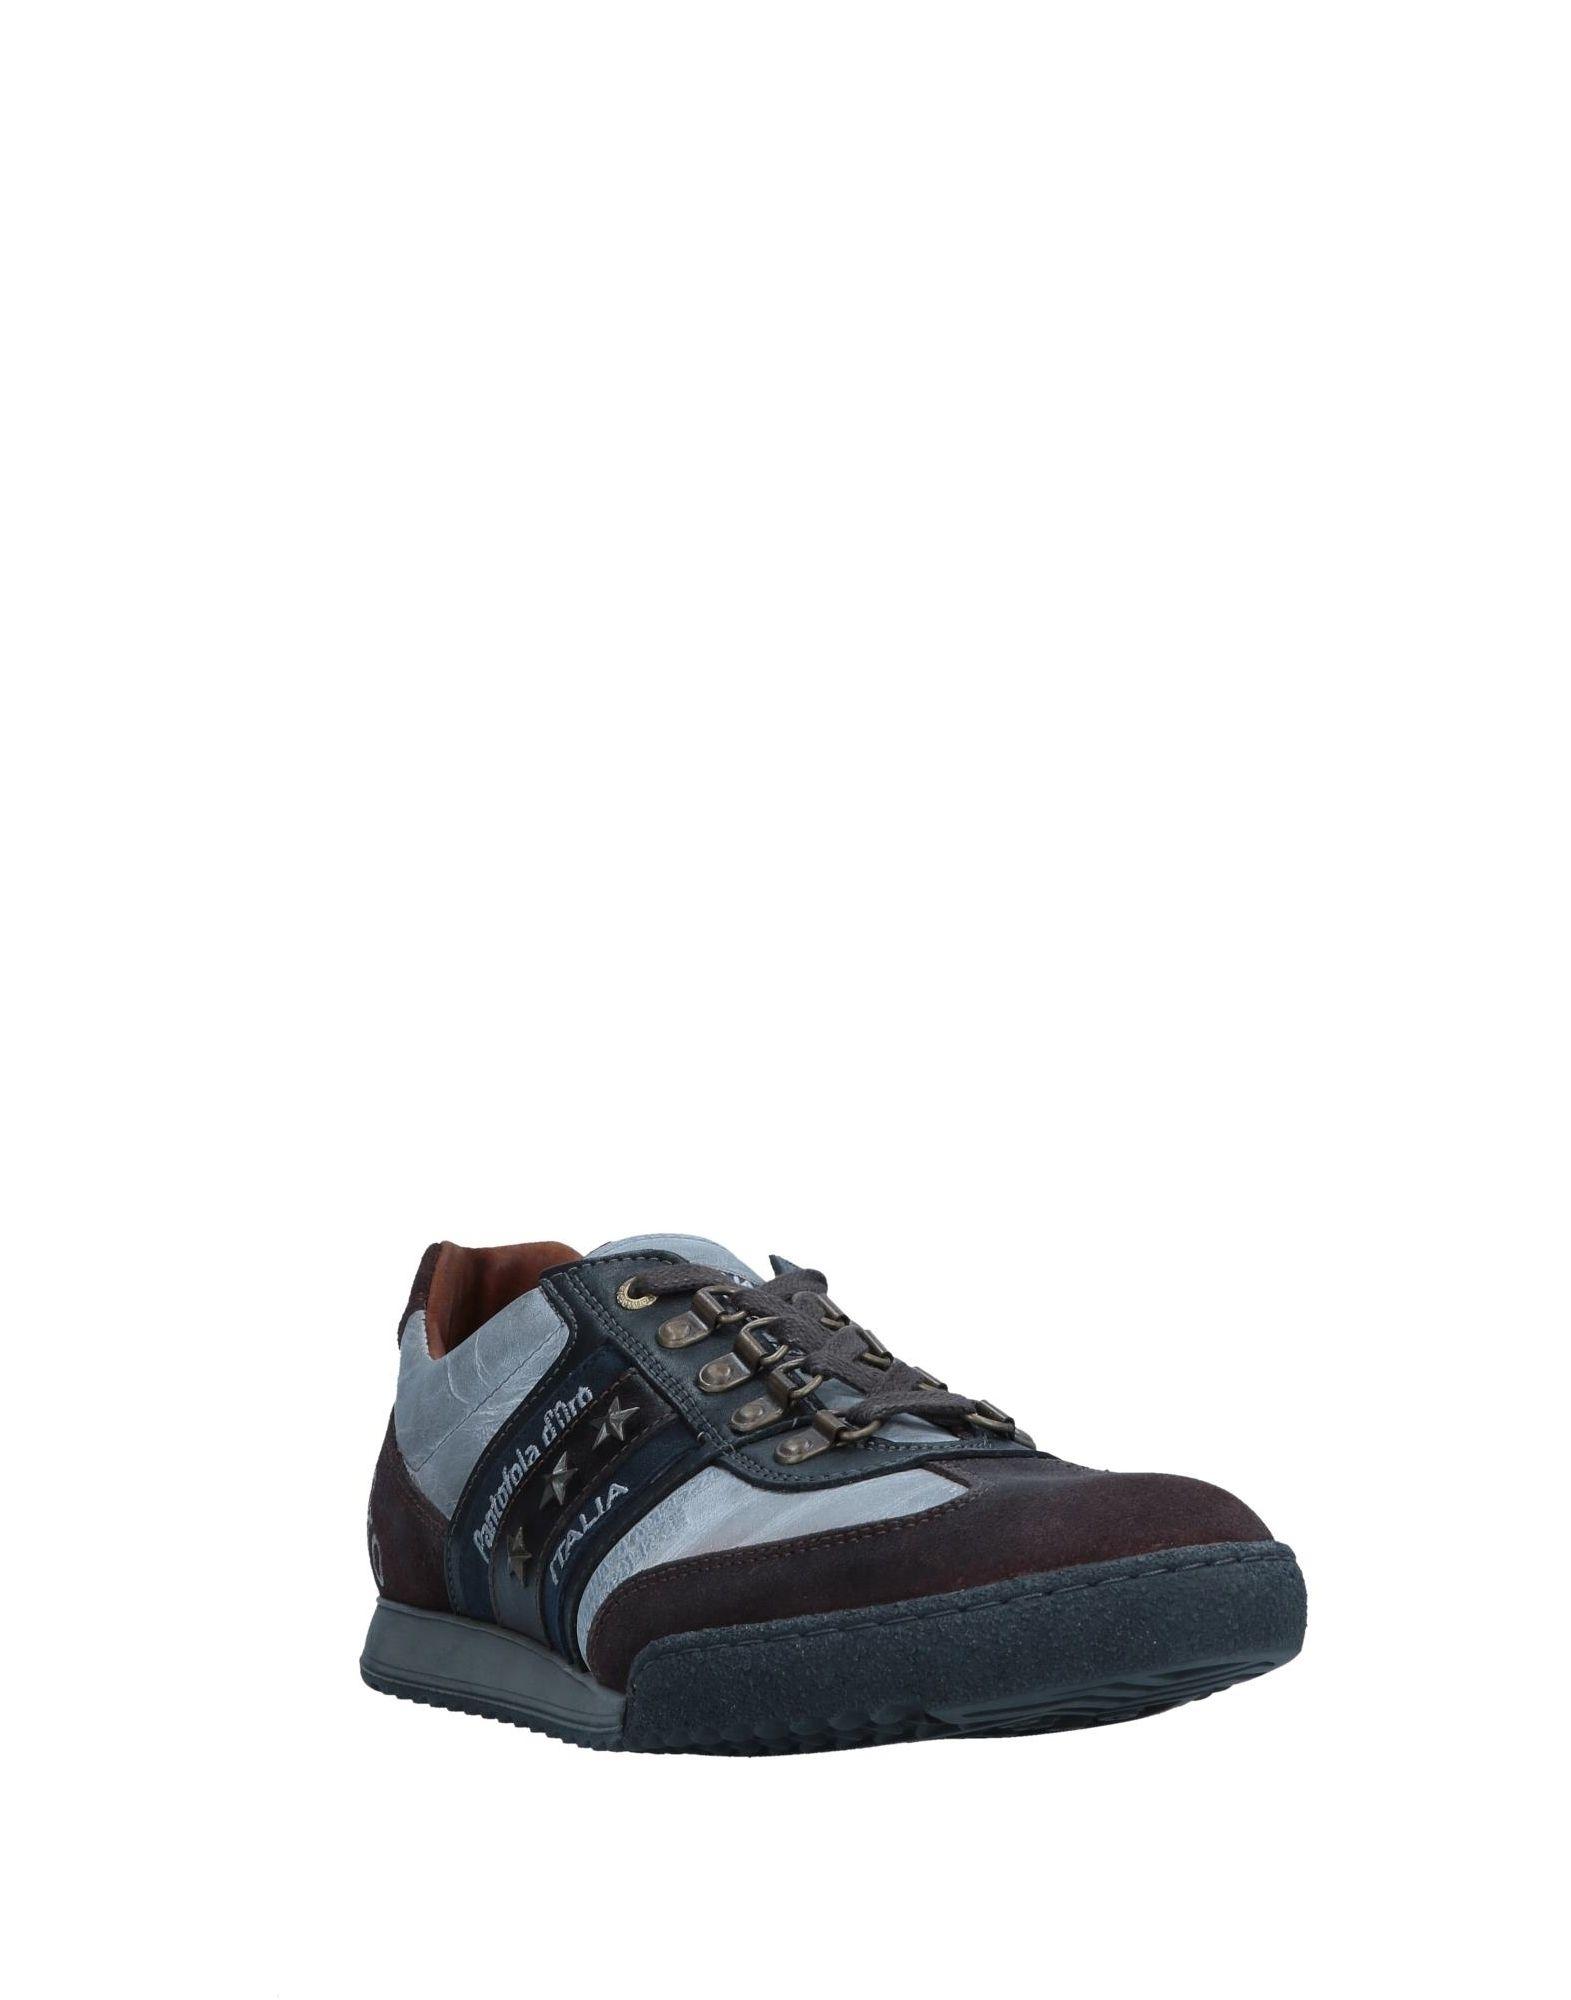 Ghōud Venice Sneakers Herren  Schuhe 11545421LA Gute Qualität beliebte Schuhe  b66b41